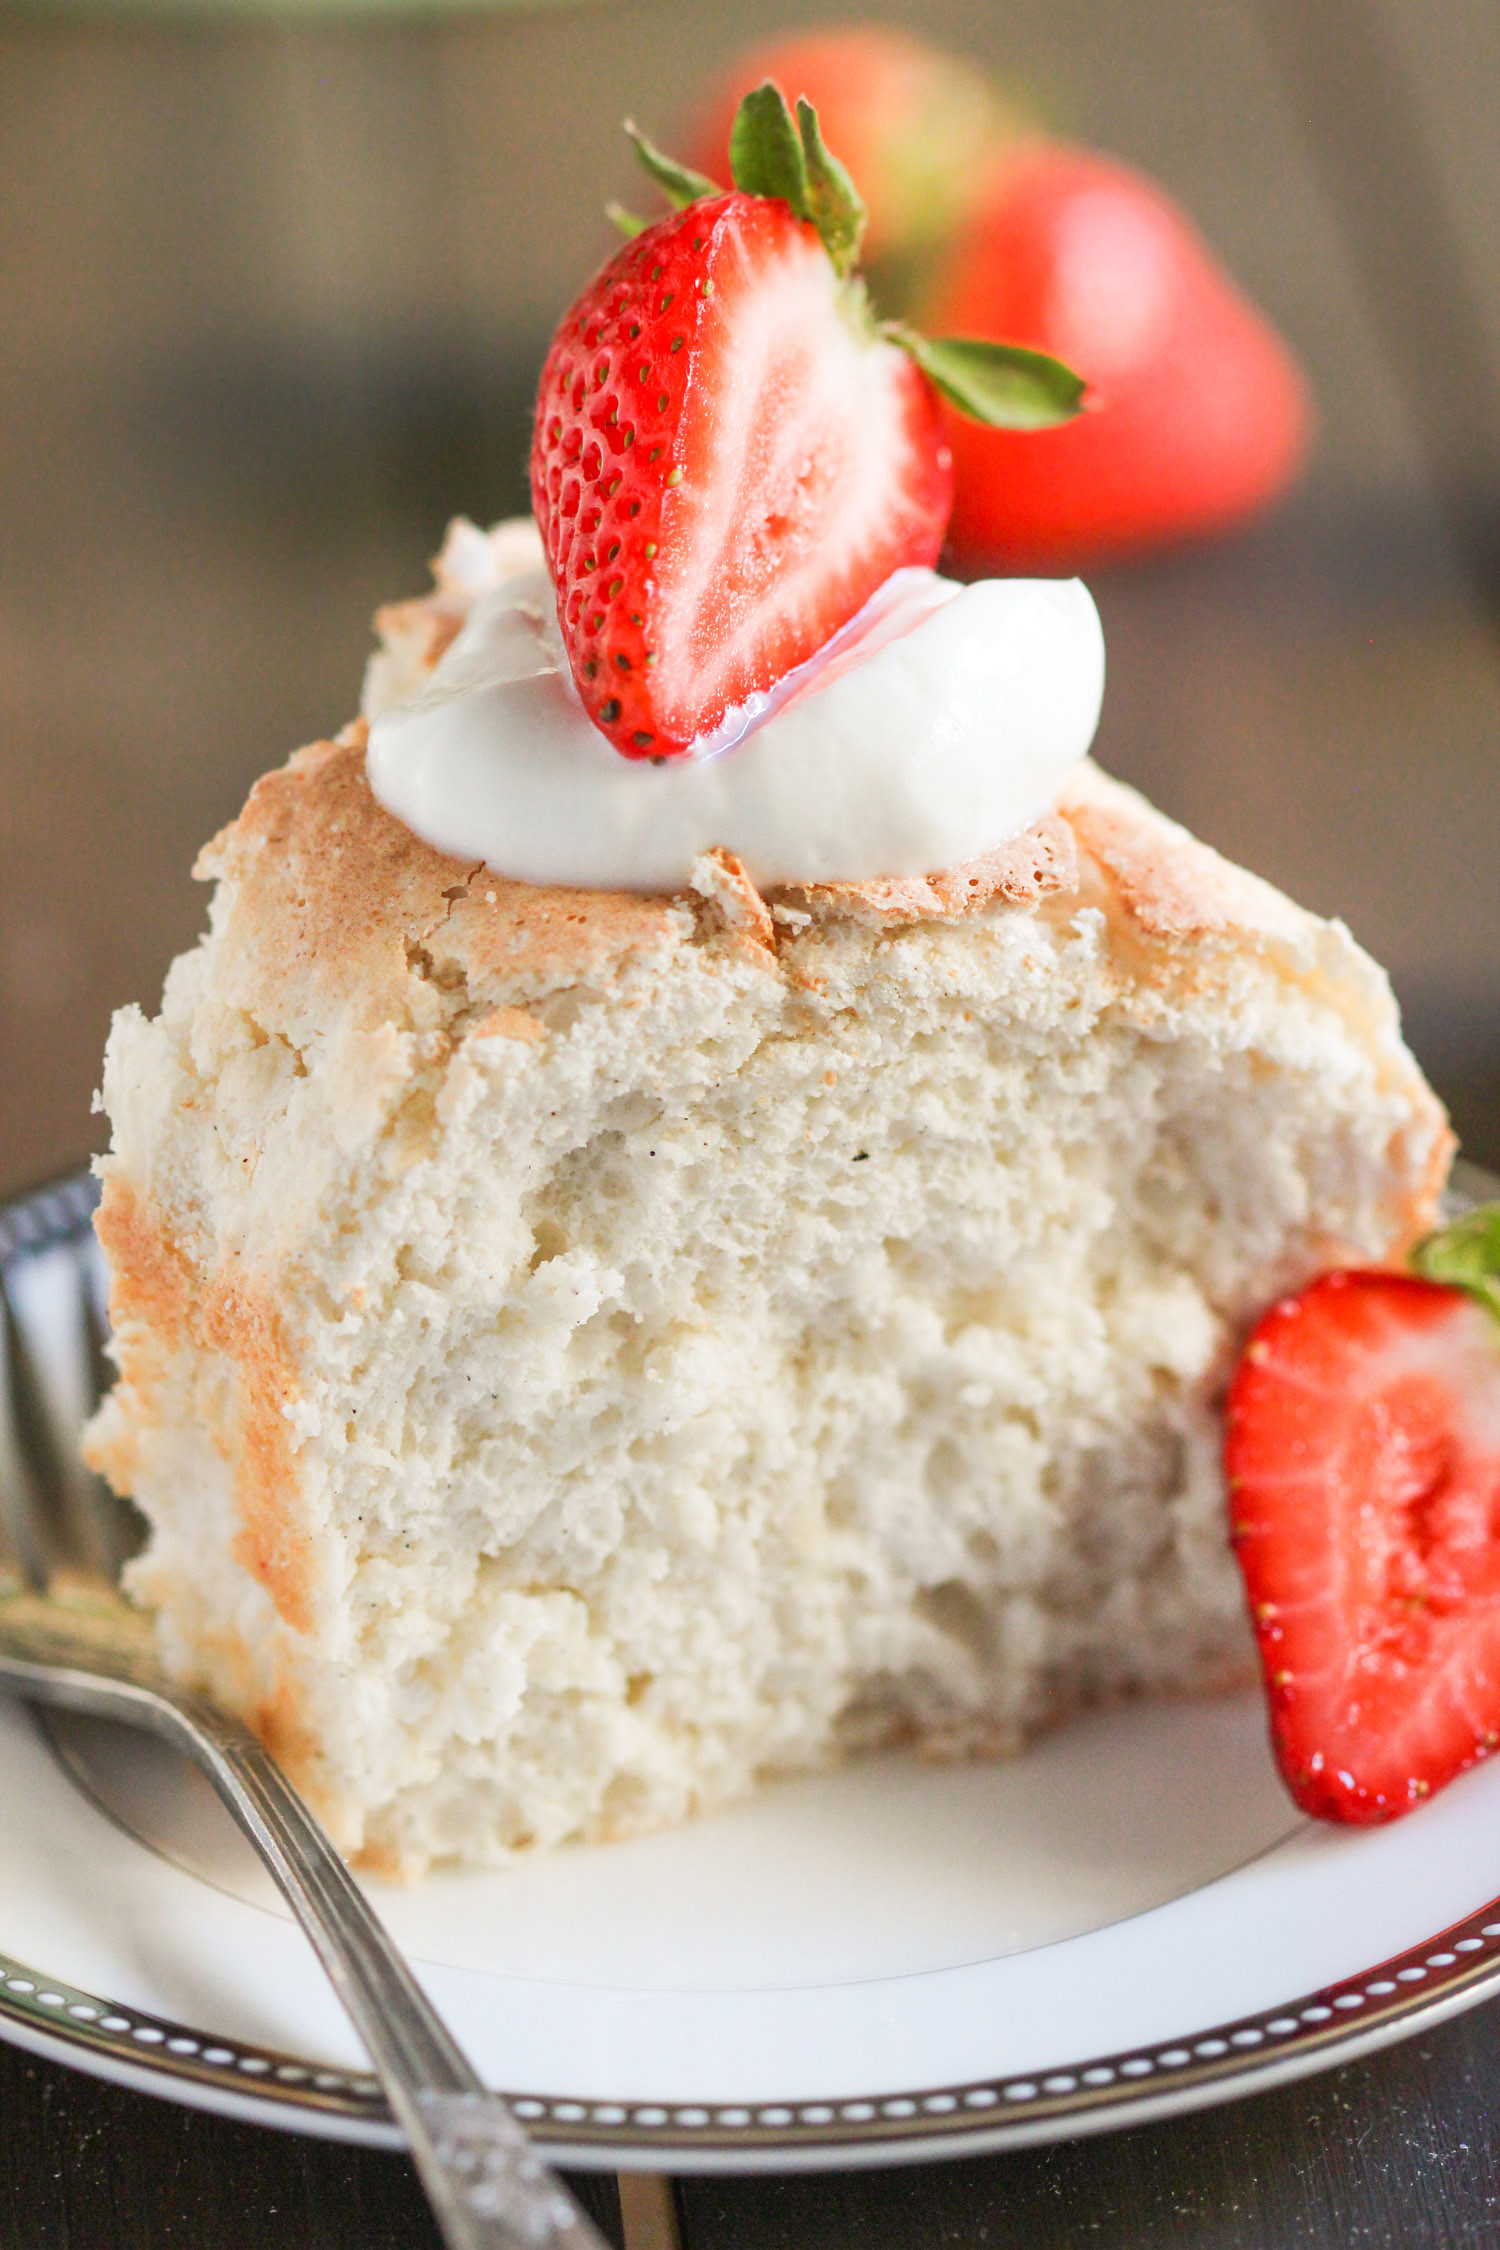 Carbs In Angel Food Cake  Healthy Angel Food Cake Recipe